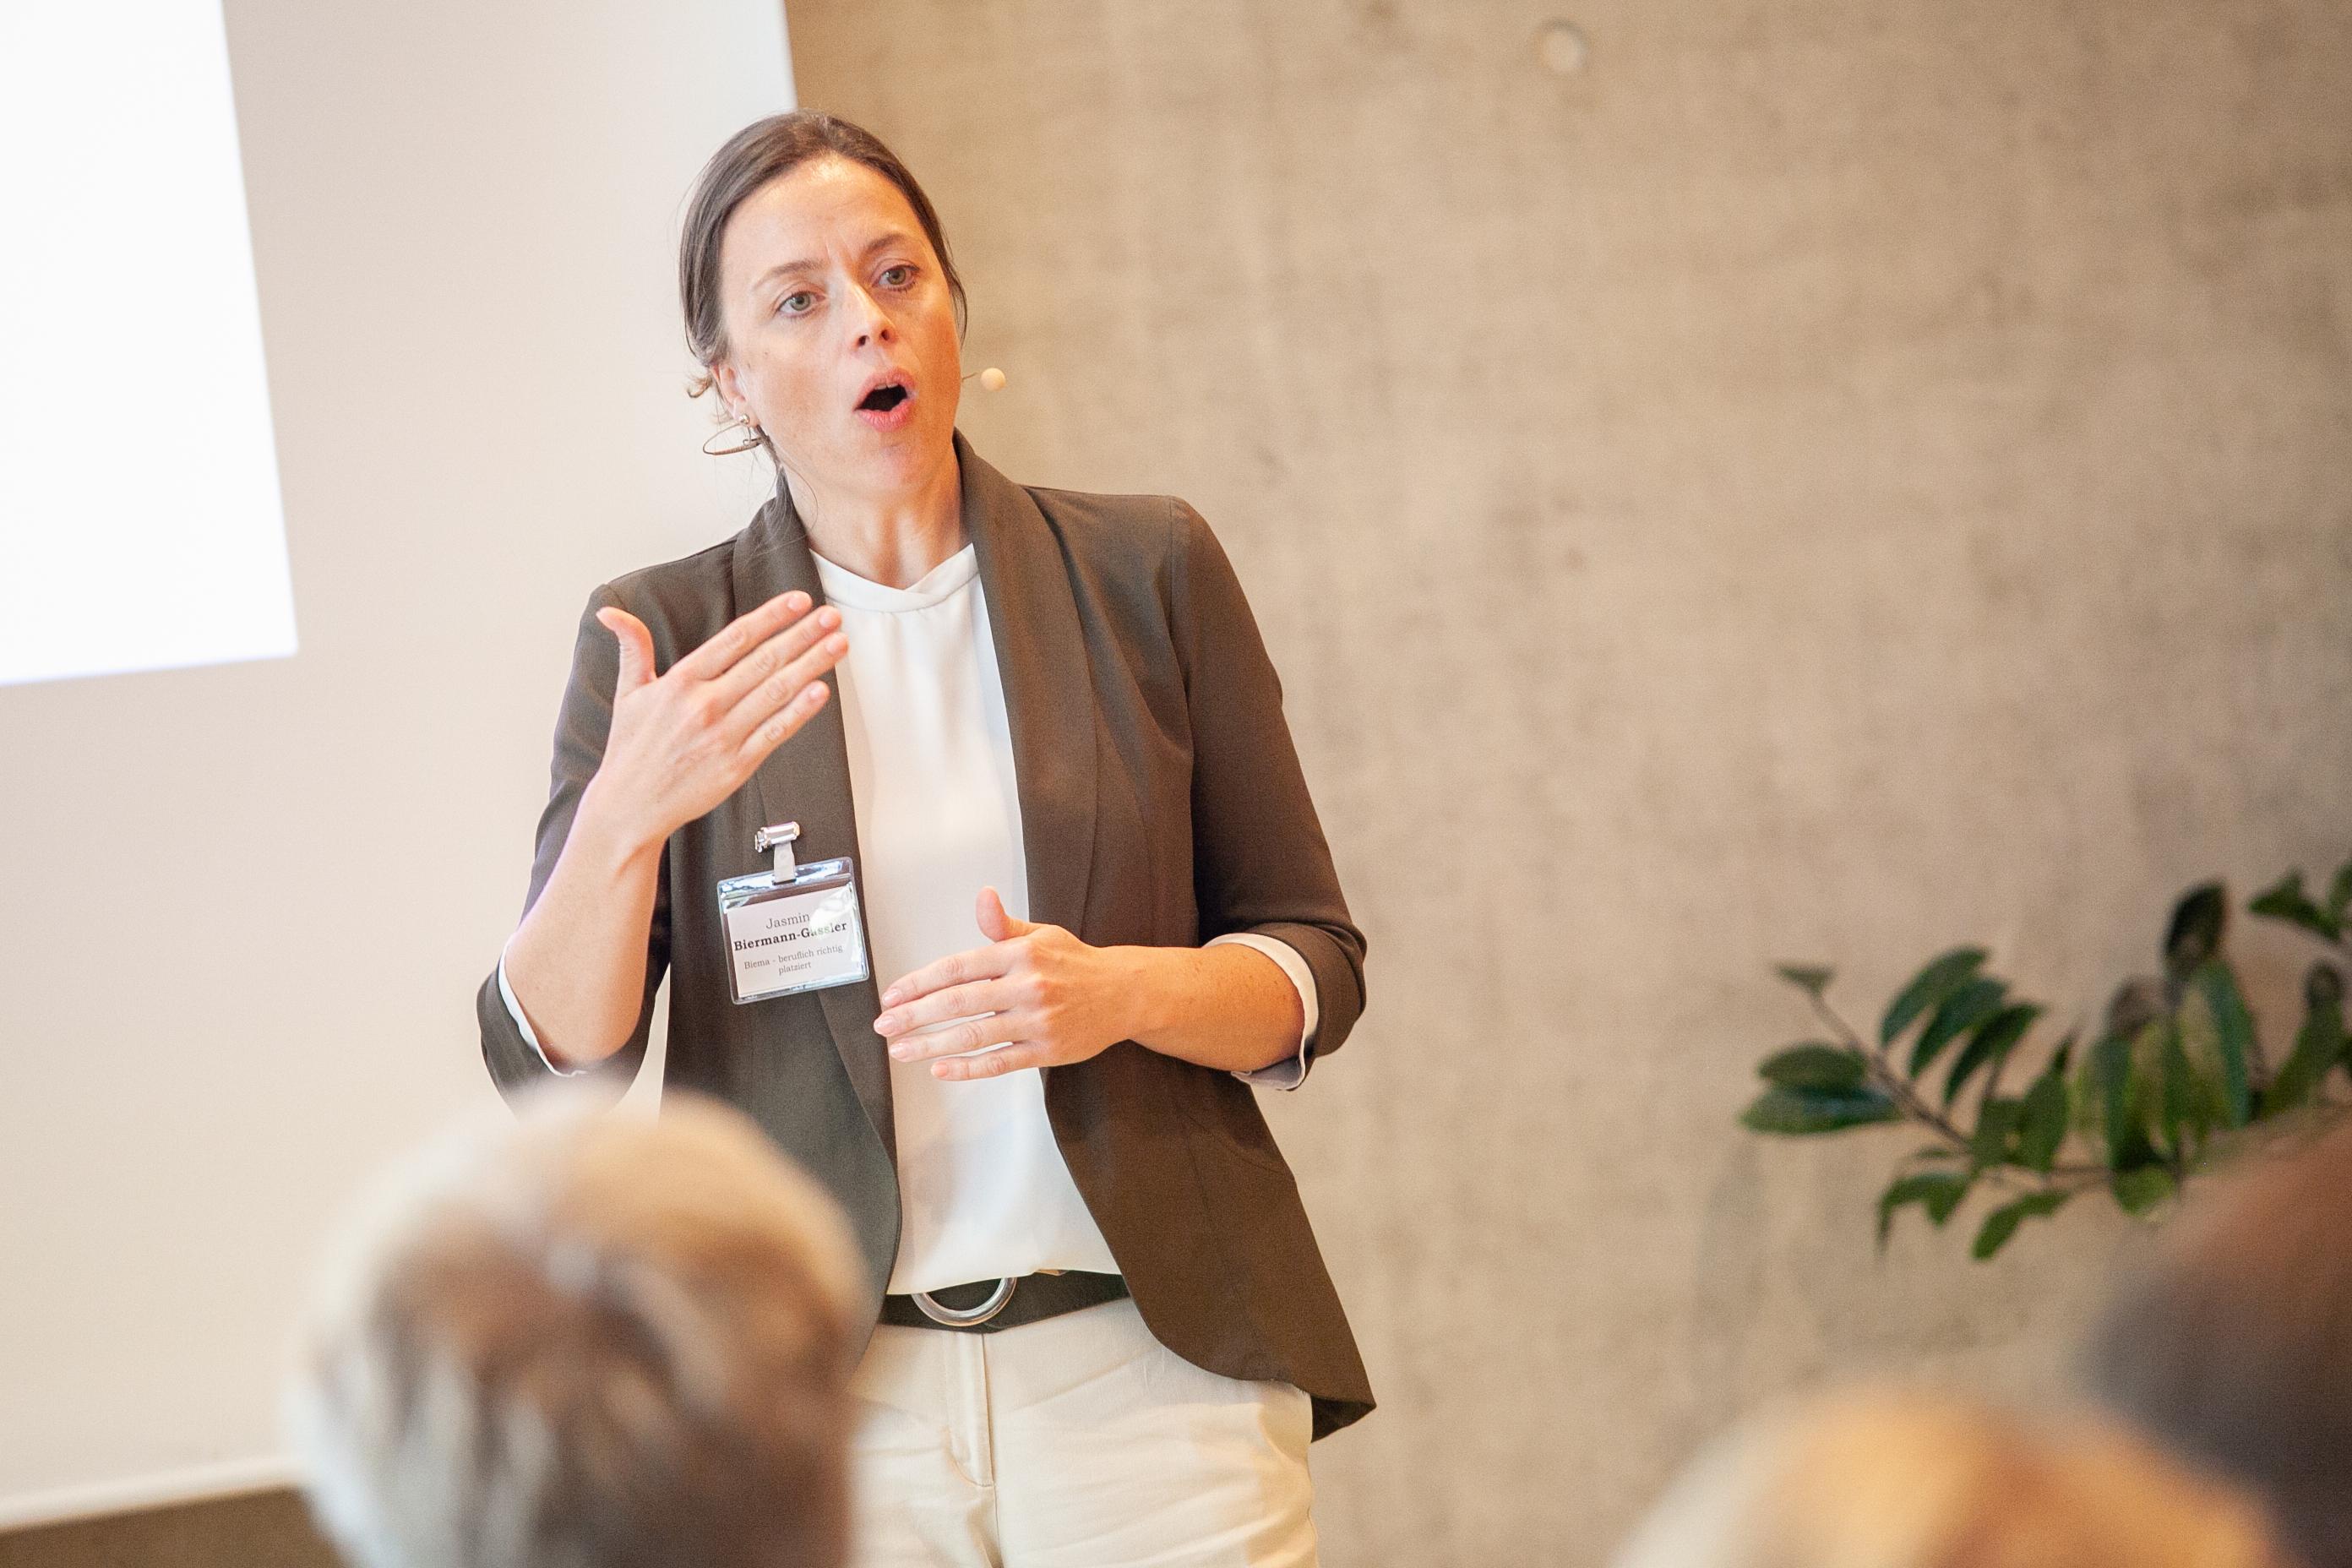 Moderatorin Jasmin Biermann-Gässler